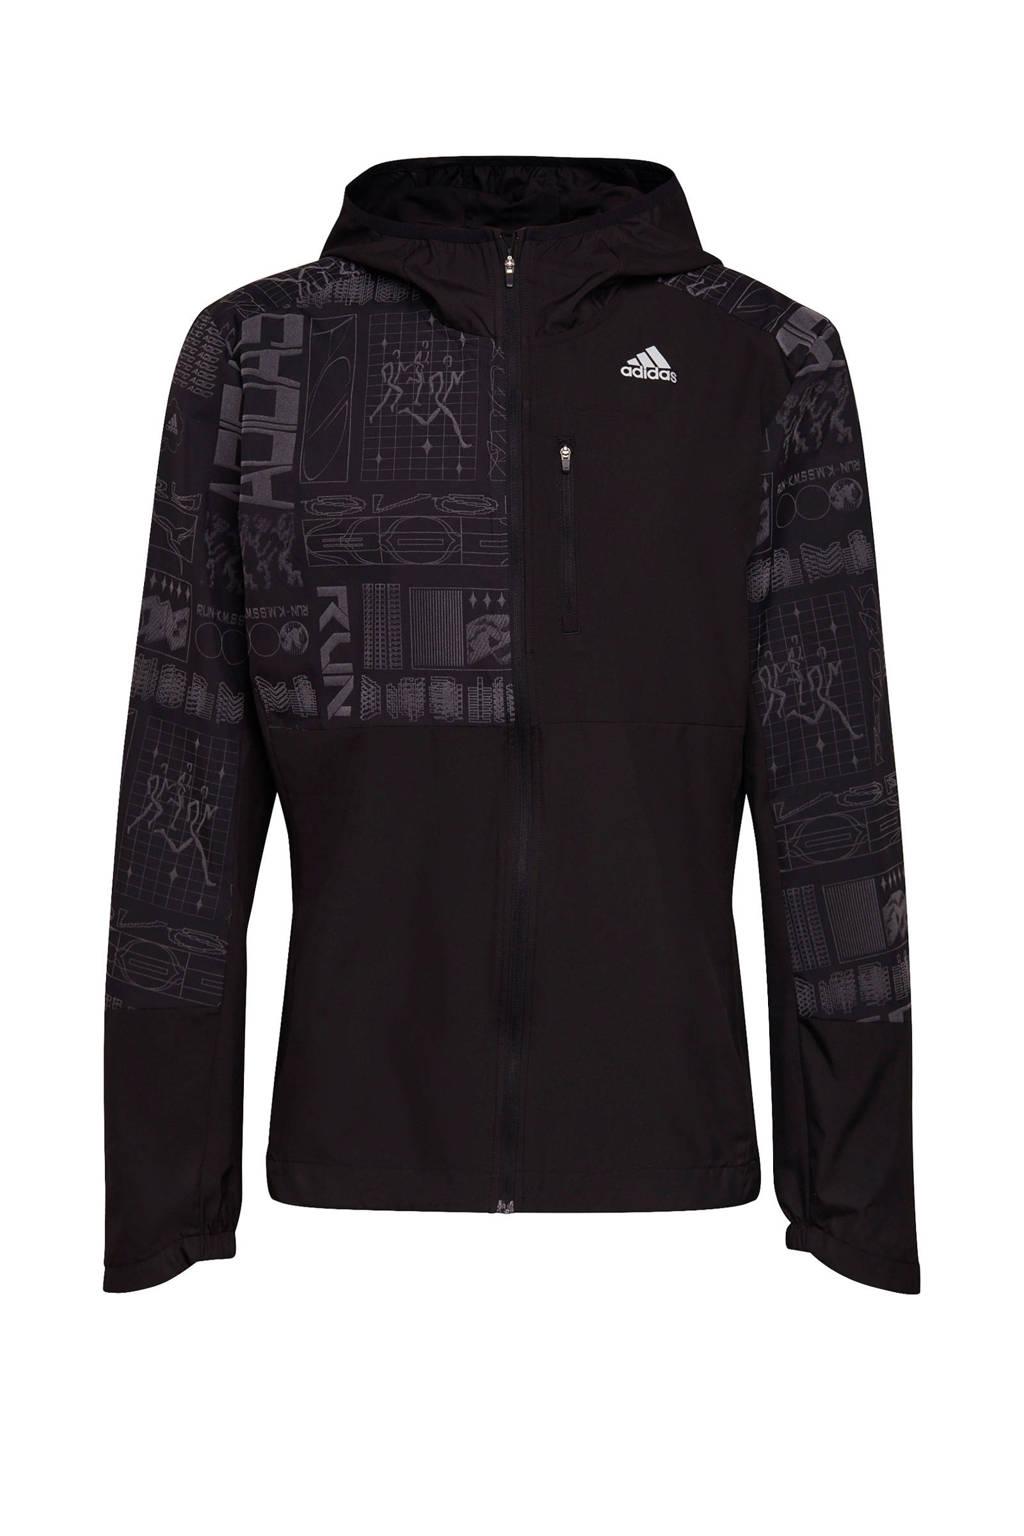 adidas Performance hardloopjack zwart, Zwart